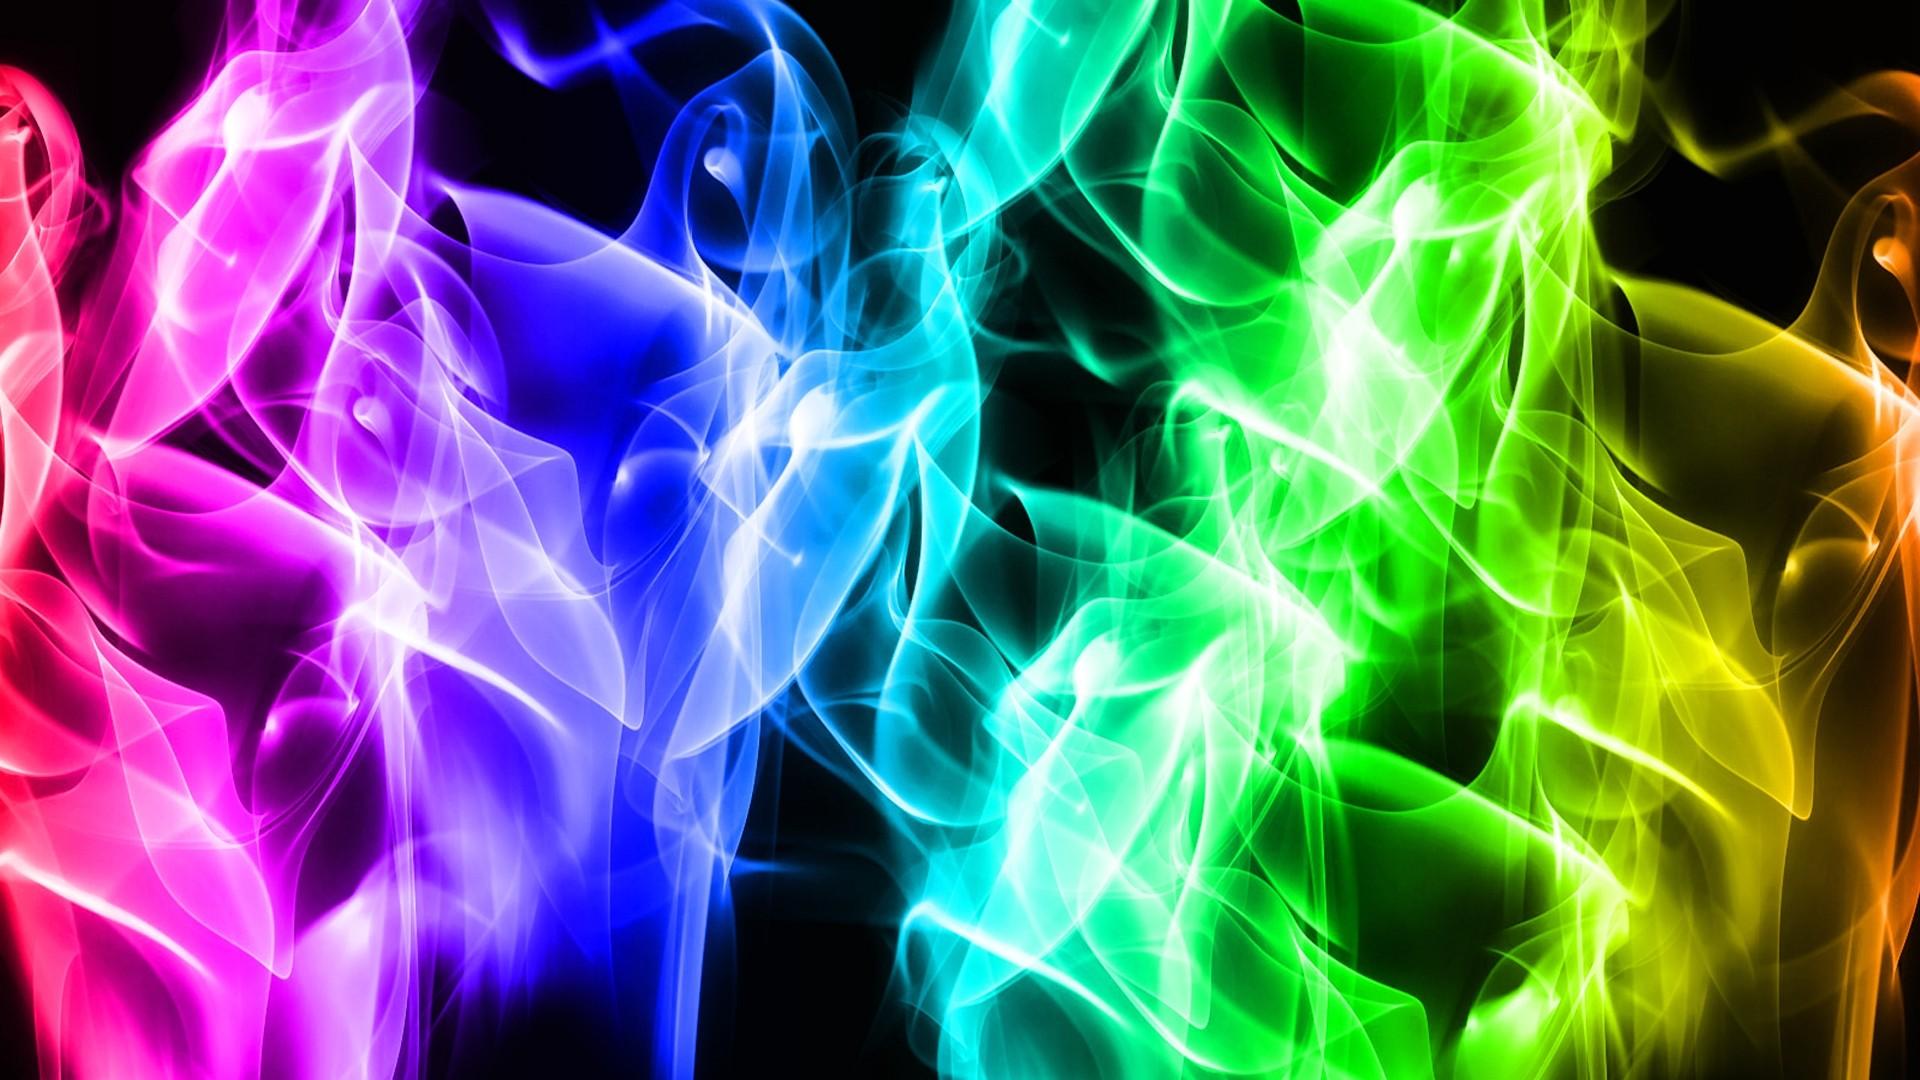 Smoke Wallpaper and Background